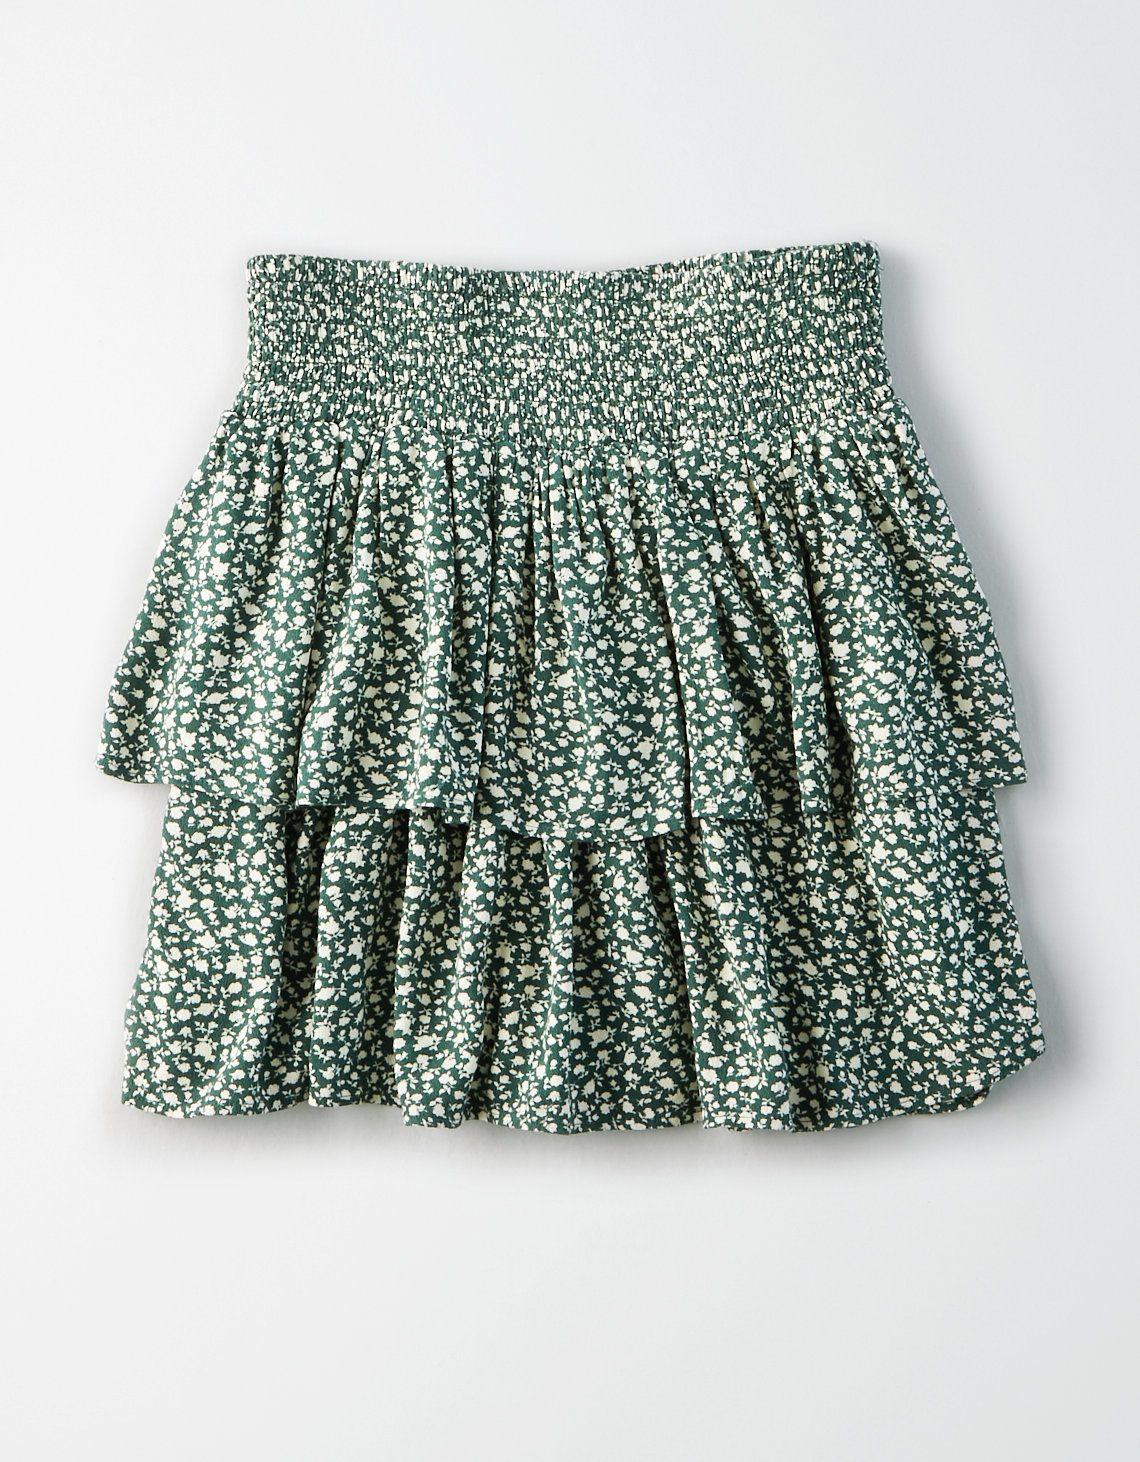 Floral Mini Skirt Vintage Button Down Mini-Skirt Floral Button Through Short Skirt Flower Print Vintage Mini Skirt Button Up Floral Skirt